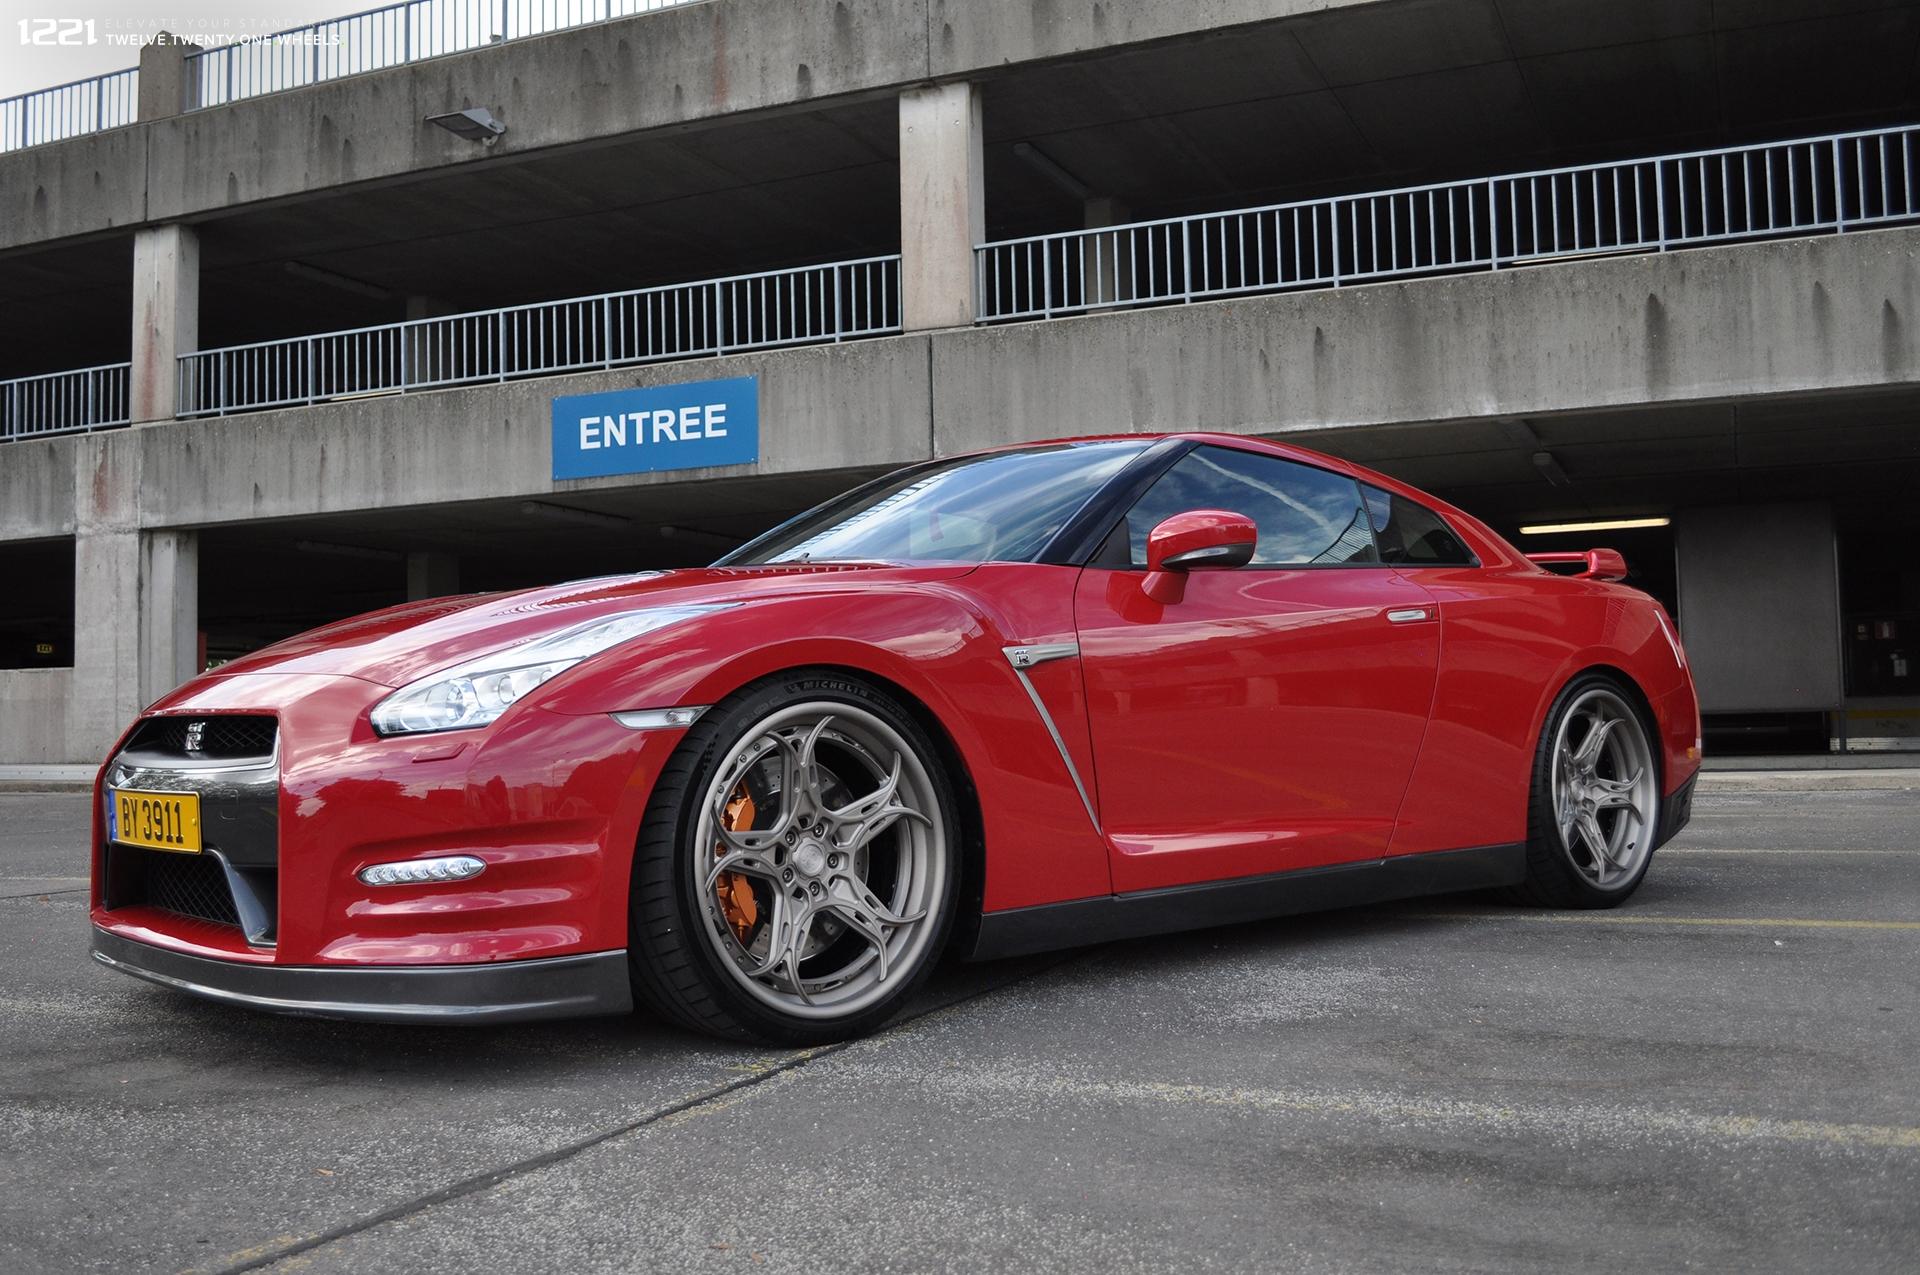 Nissan GTR Forged Wheels